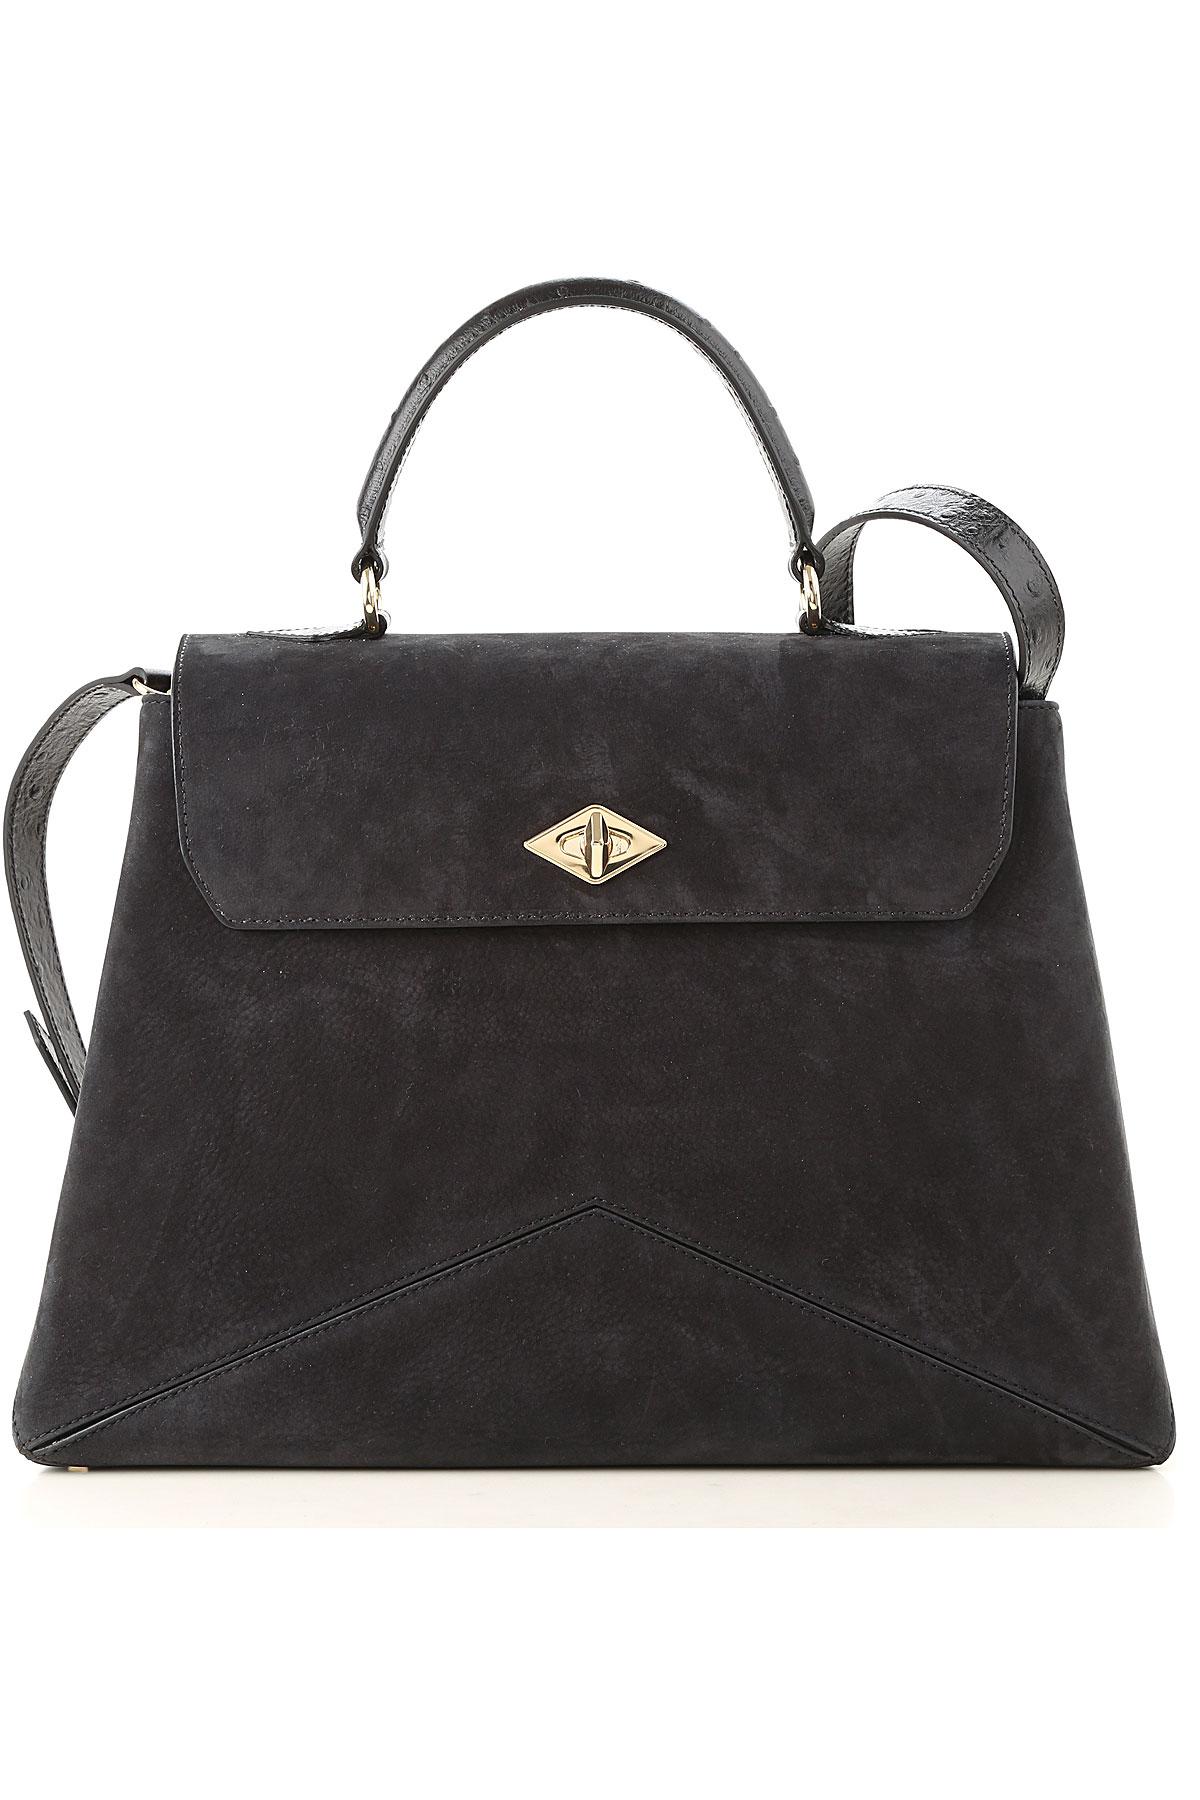 Image of Ballantyne Top Handle Handbag, Blue Navy Melange, suede, 2017